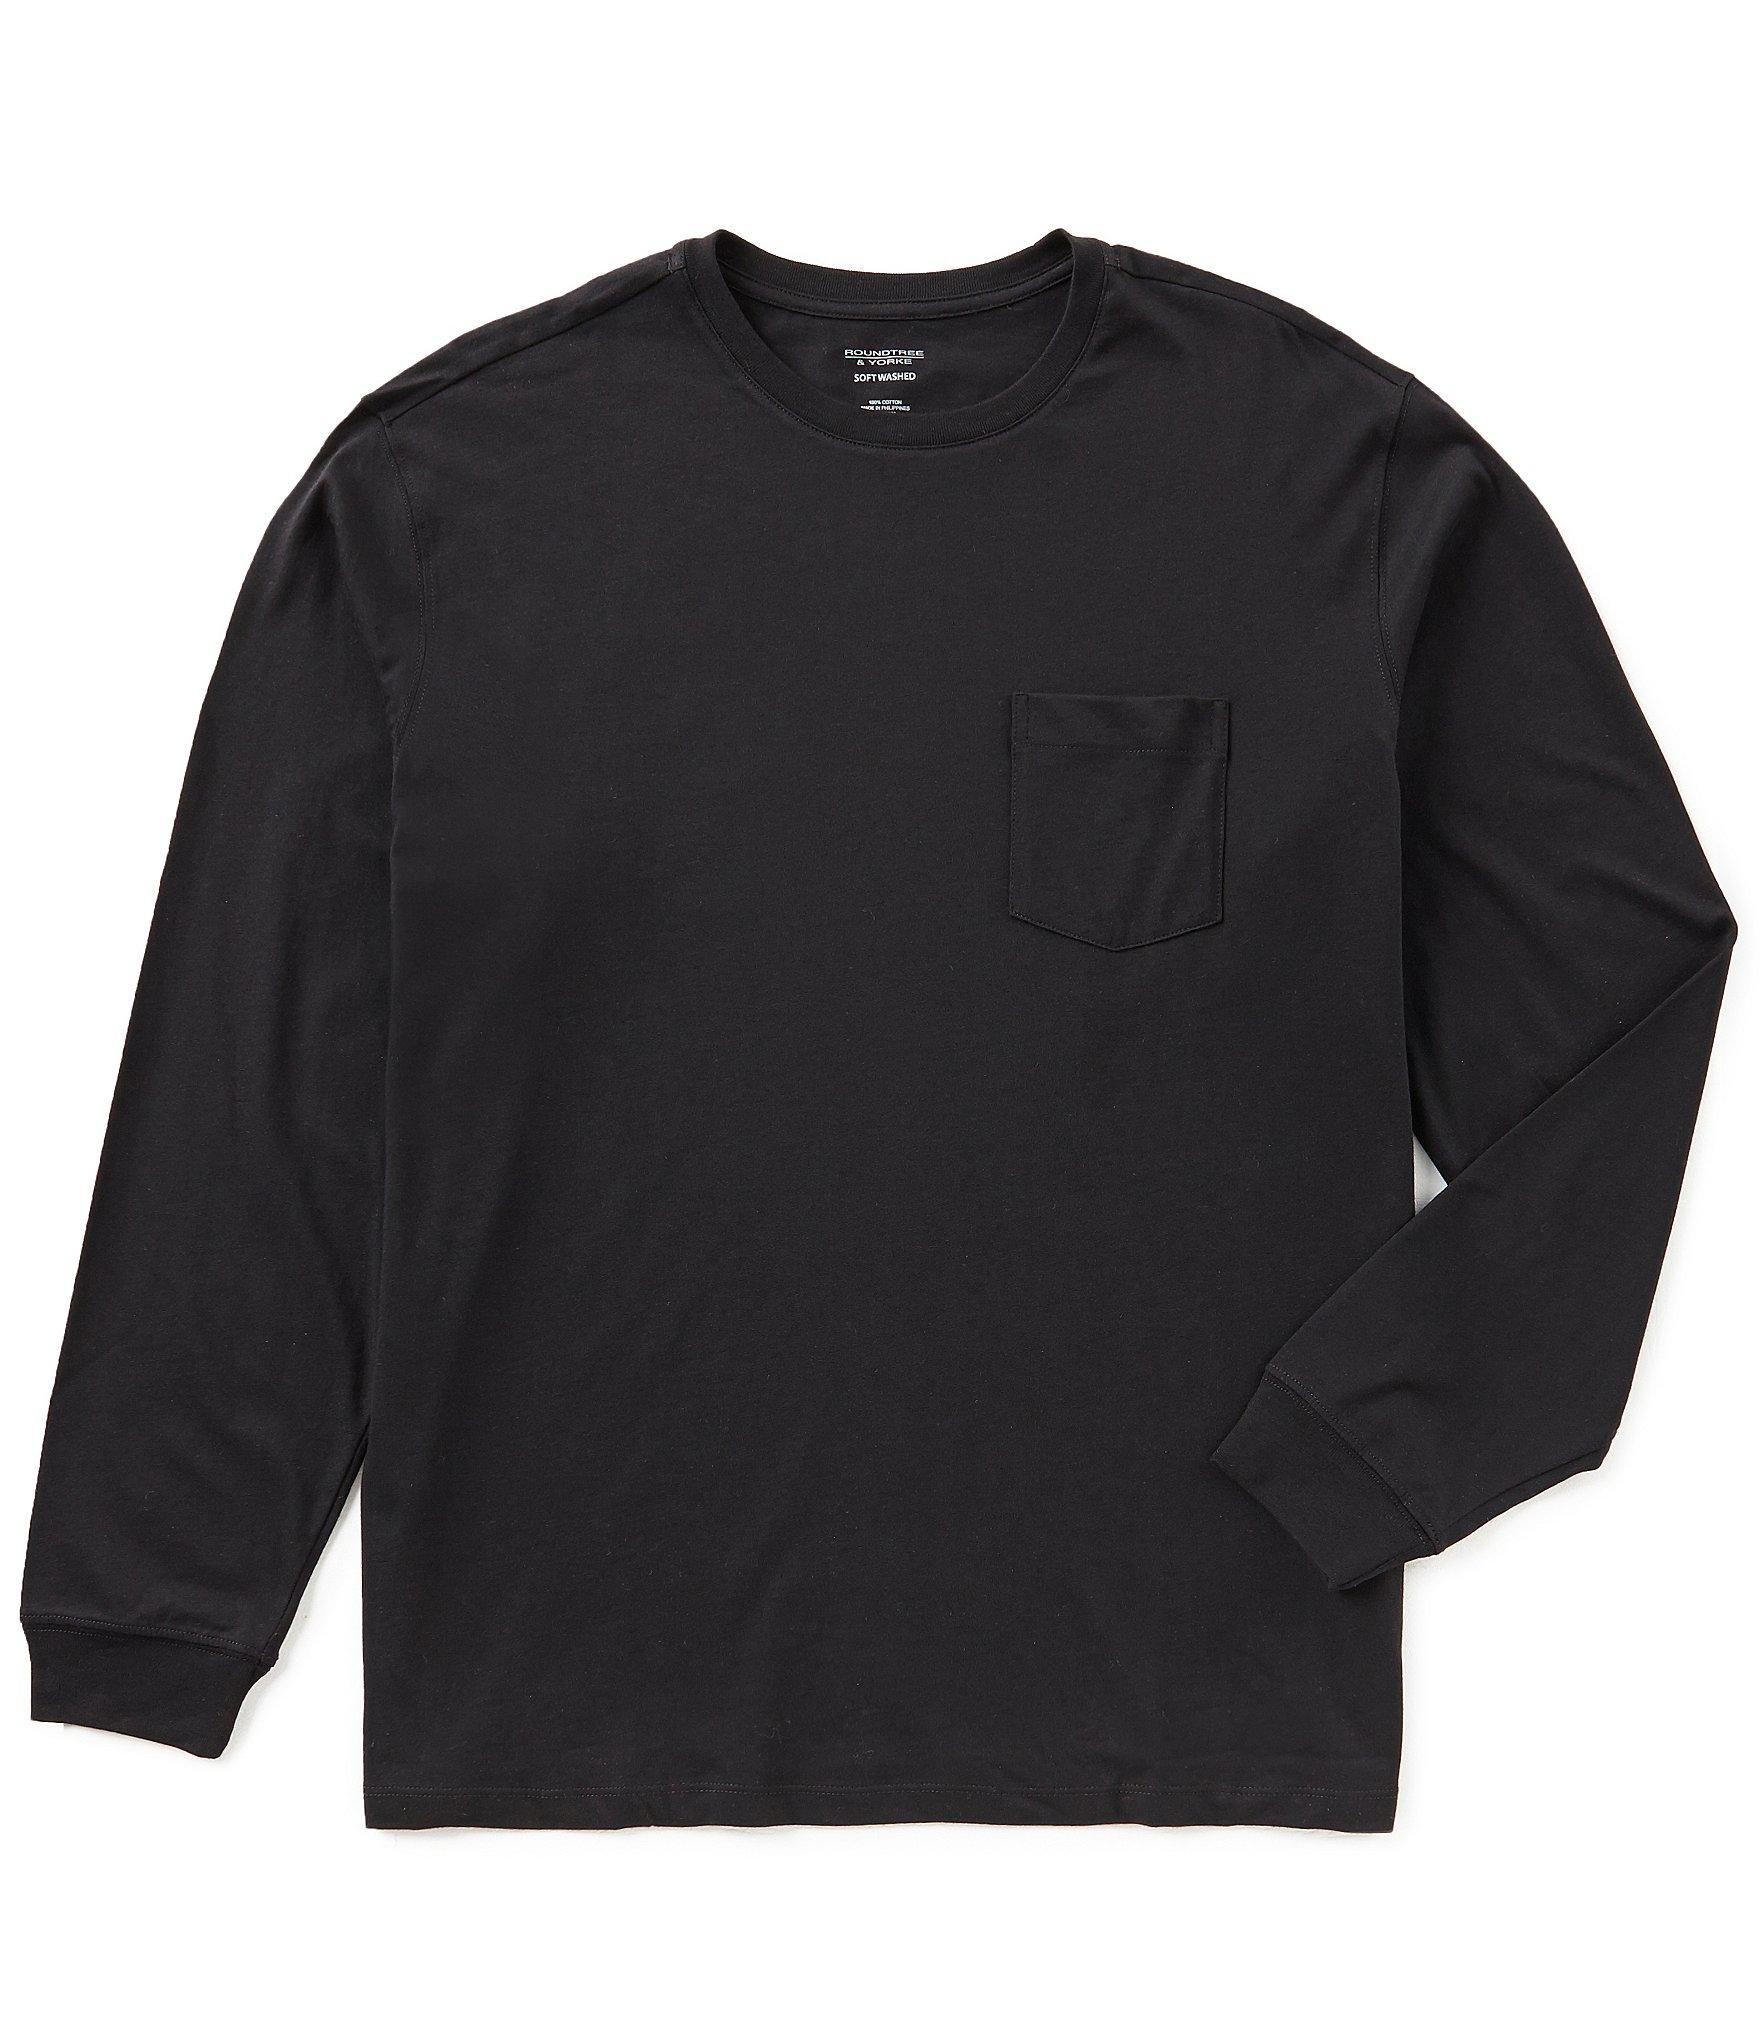 Black t shirts hollister - Black T Shirts Hollister 47